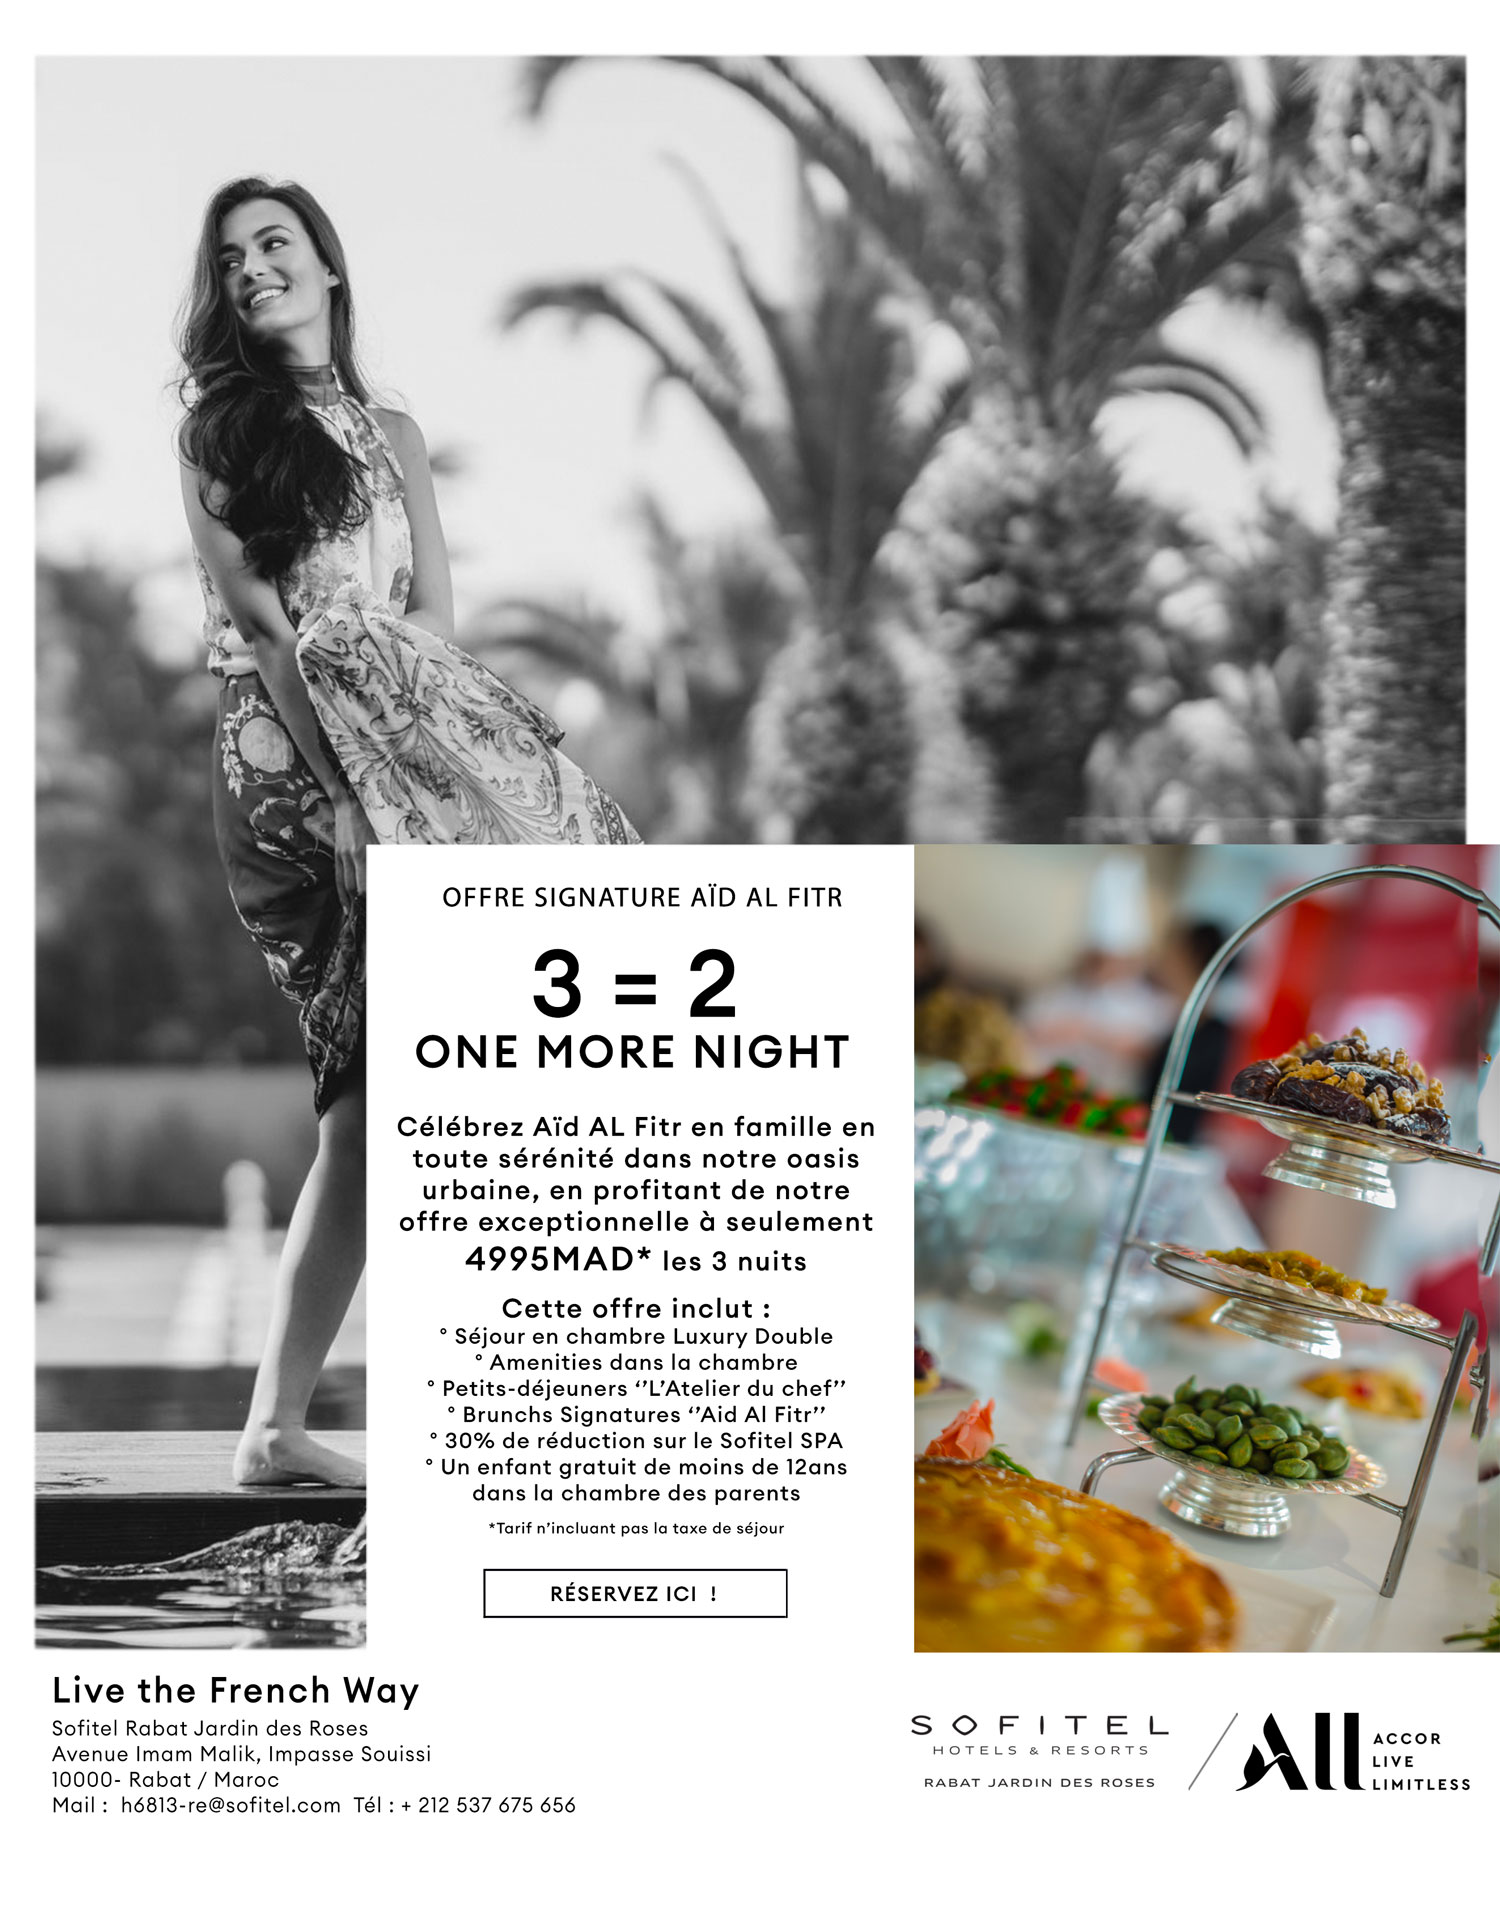 One More Night au Sofitel Rabat Jardin des Roses Offre Signature pour Aid Al Fitr